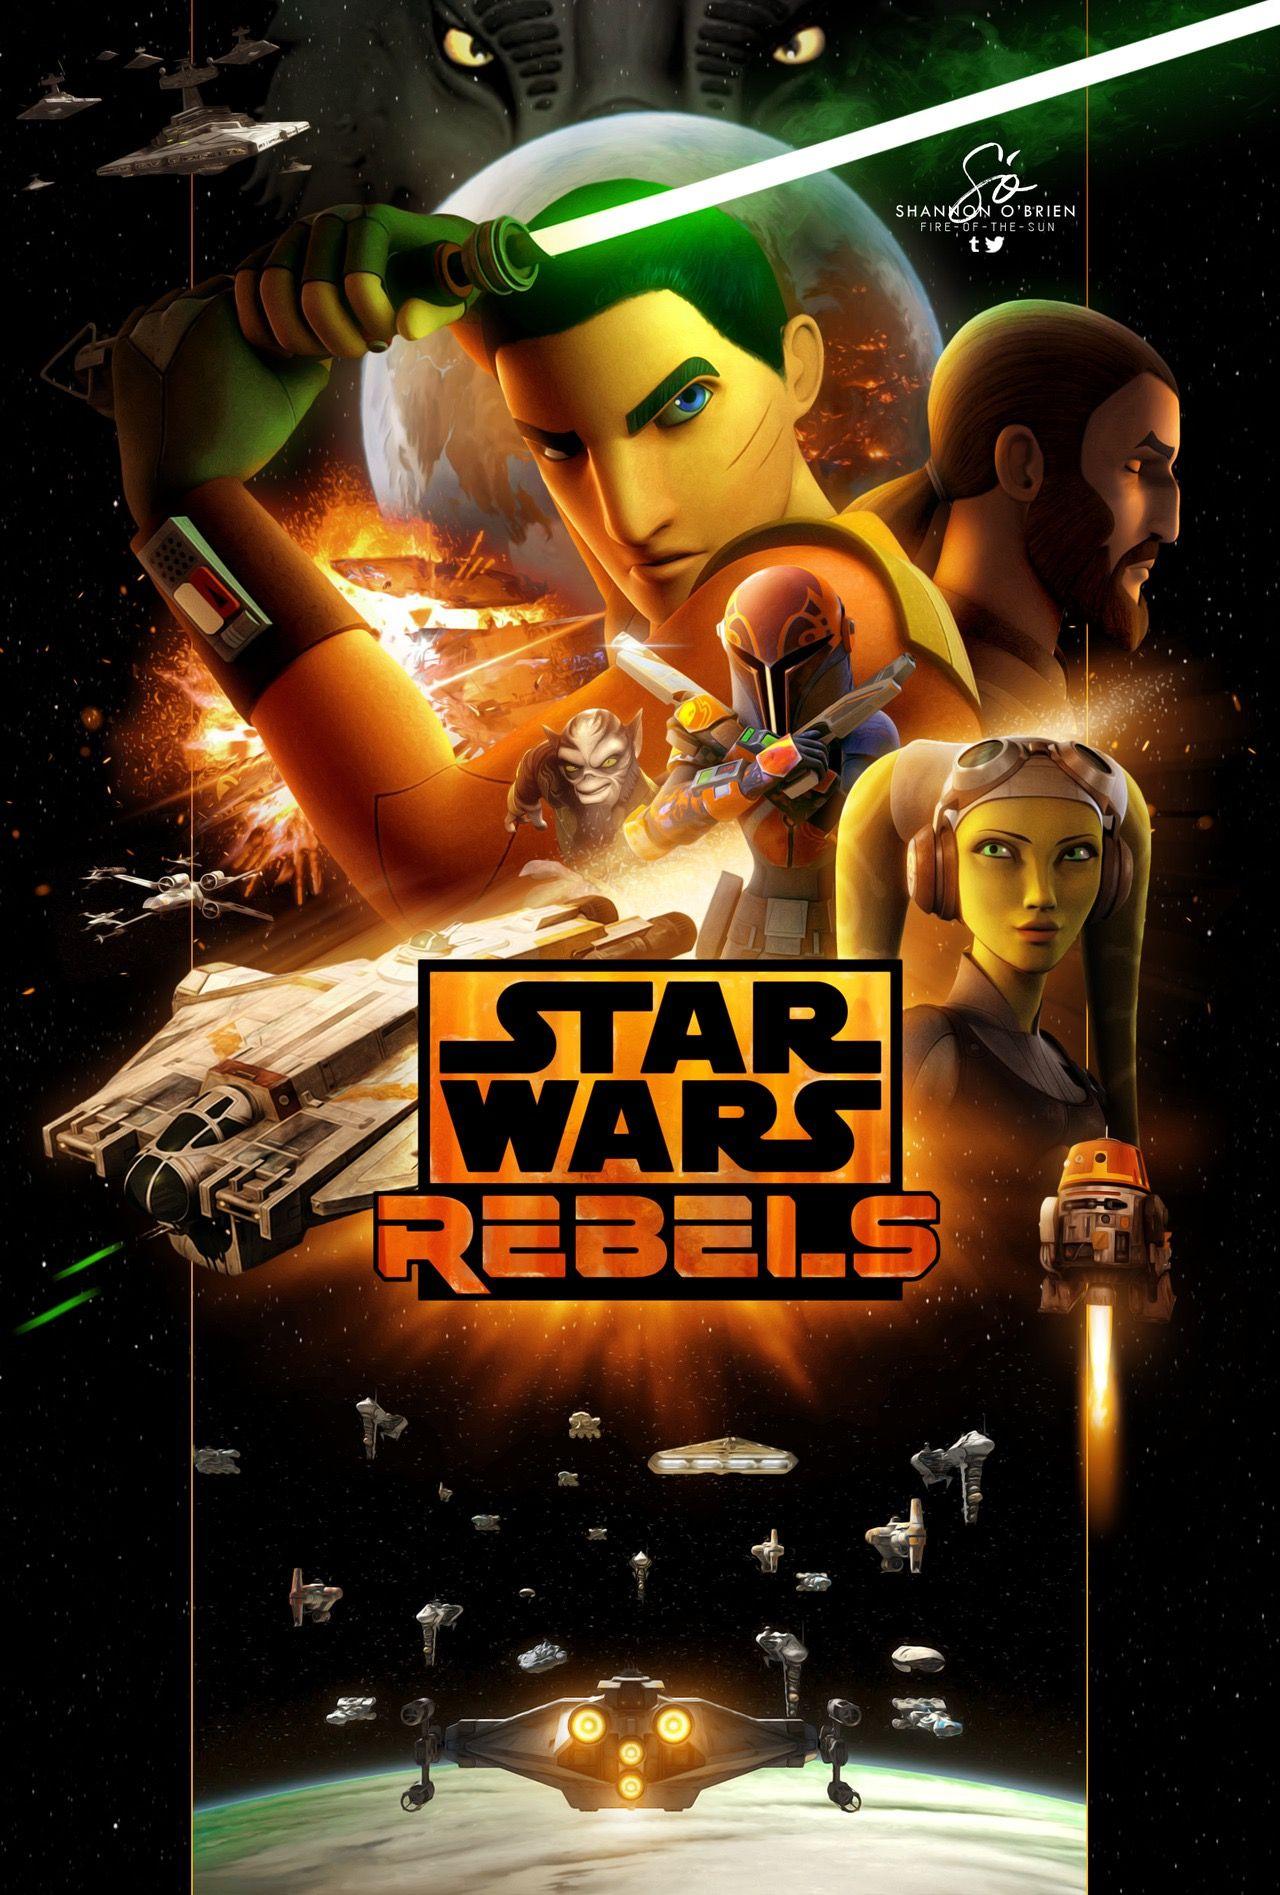 Star Wars Rebels Wallpaper Posted By Sarah Sellers